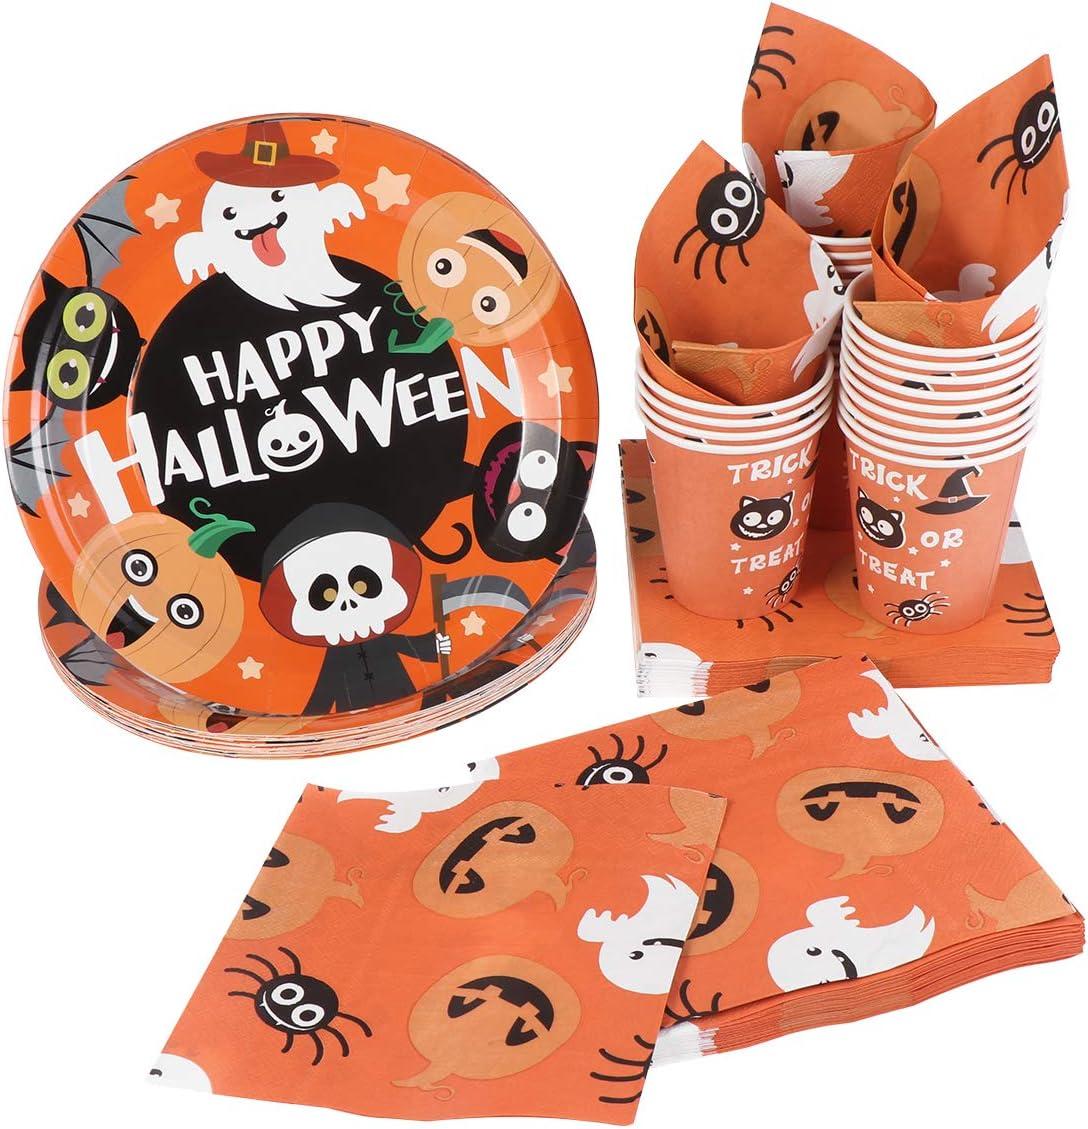 Halloween Character Party Tableware Bundles